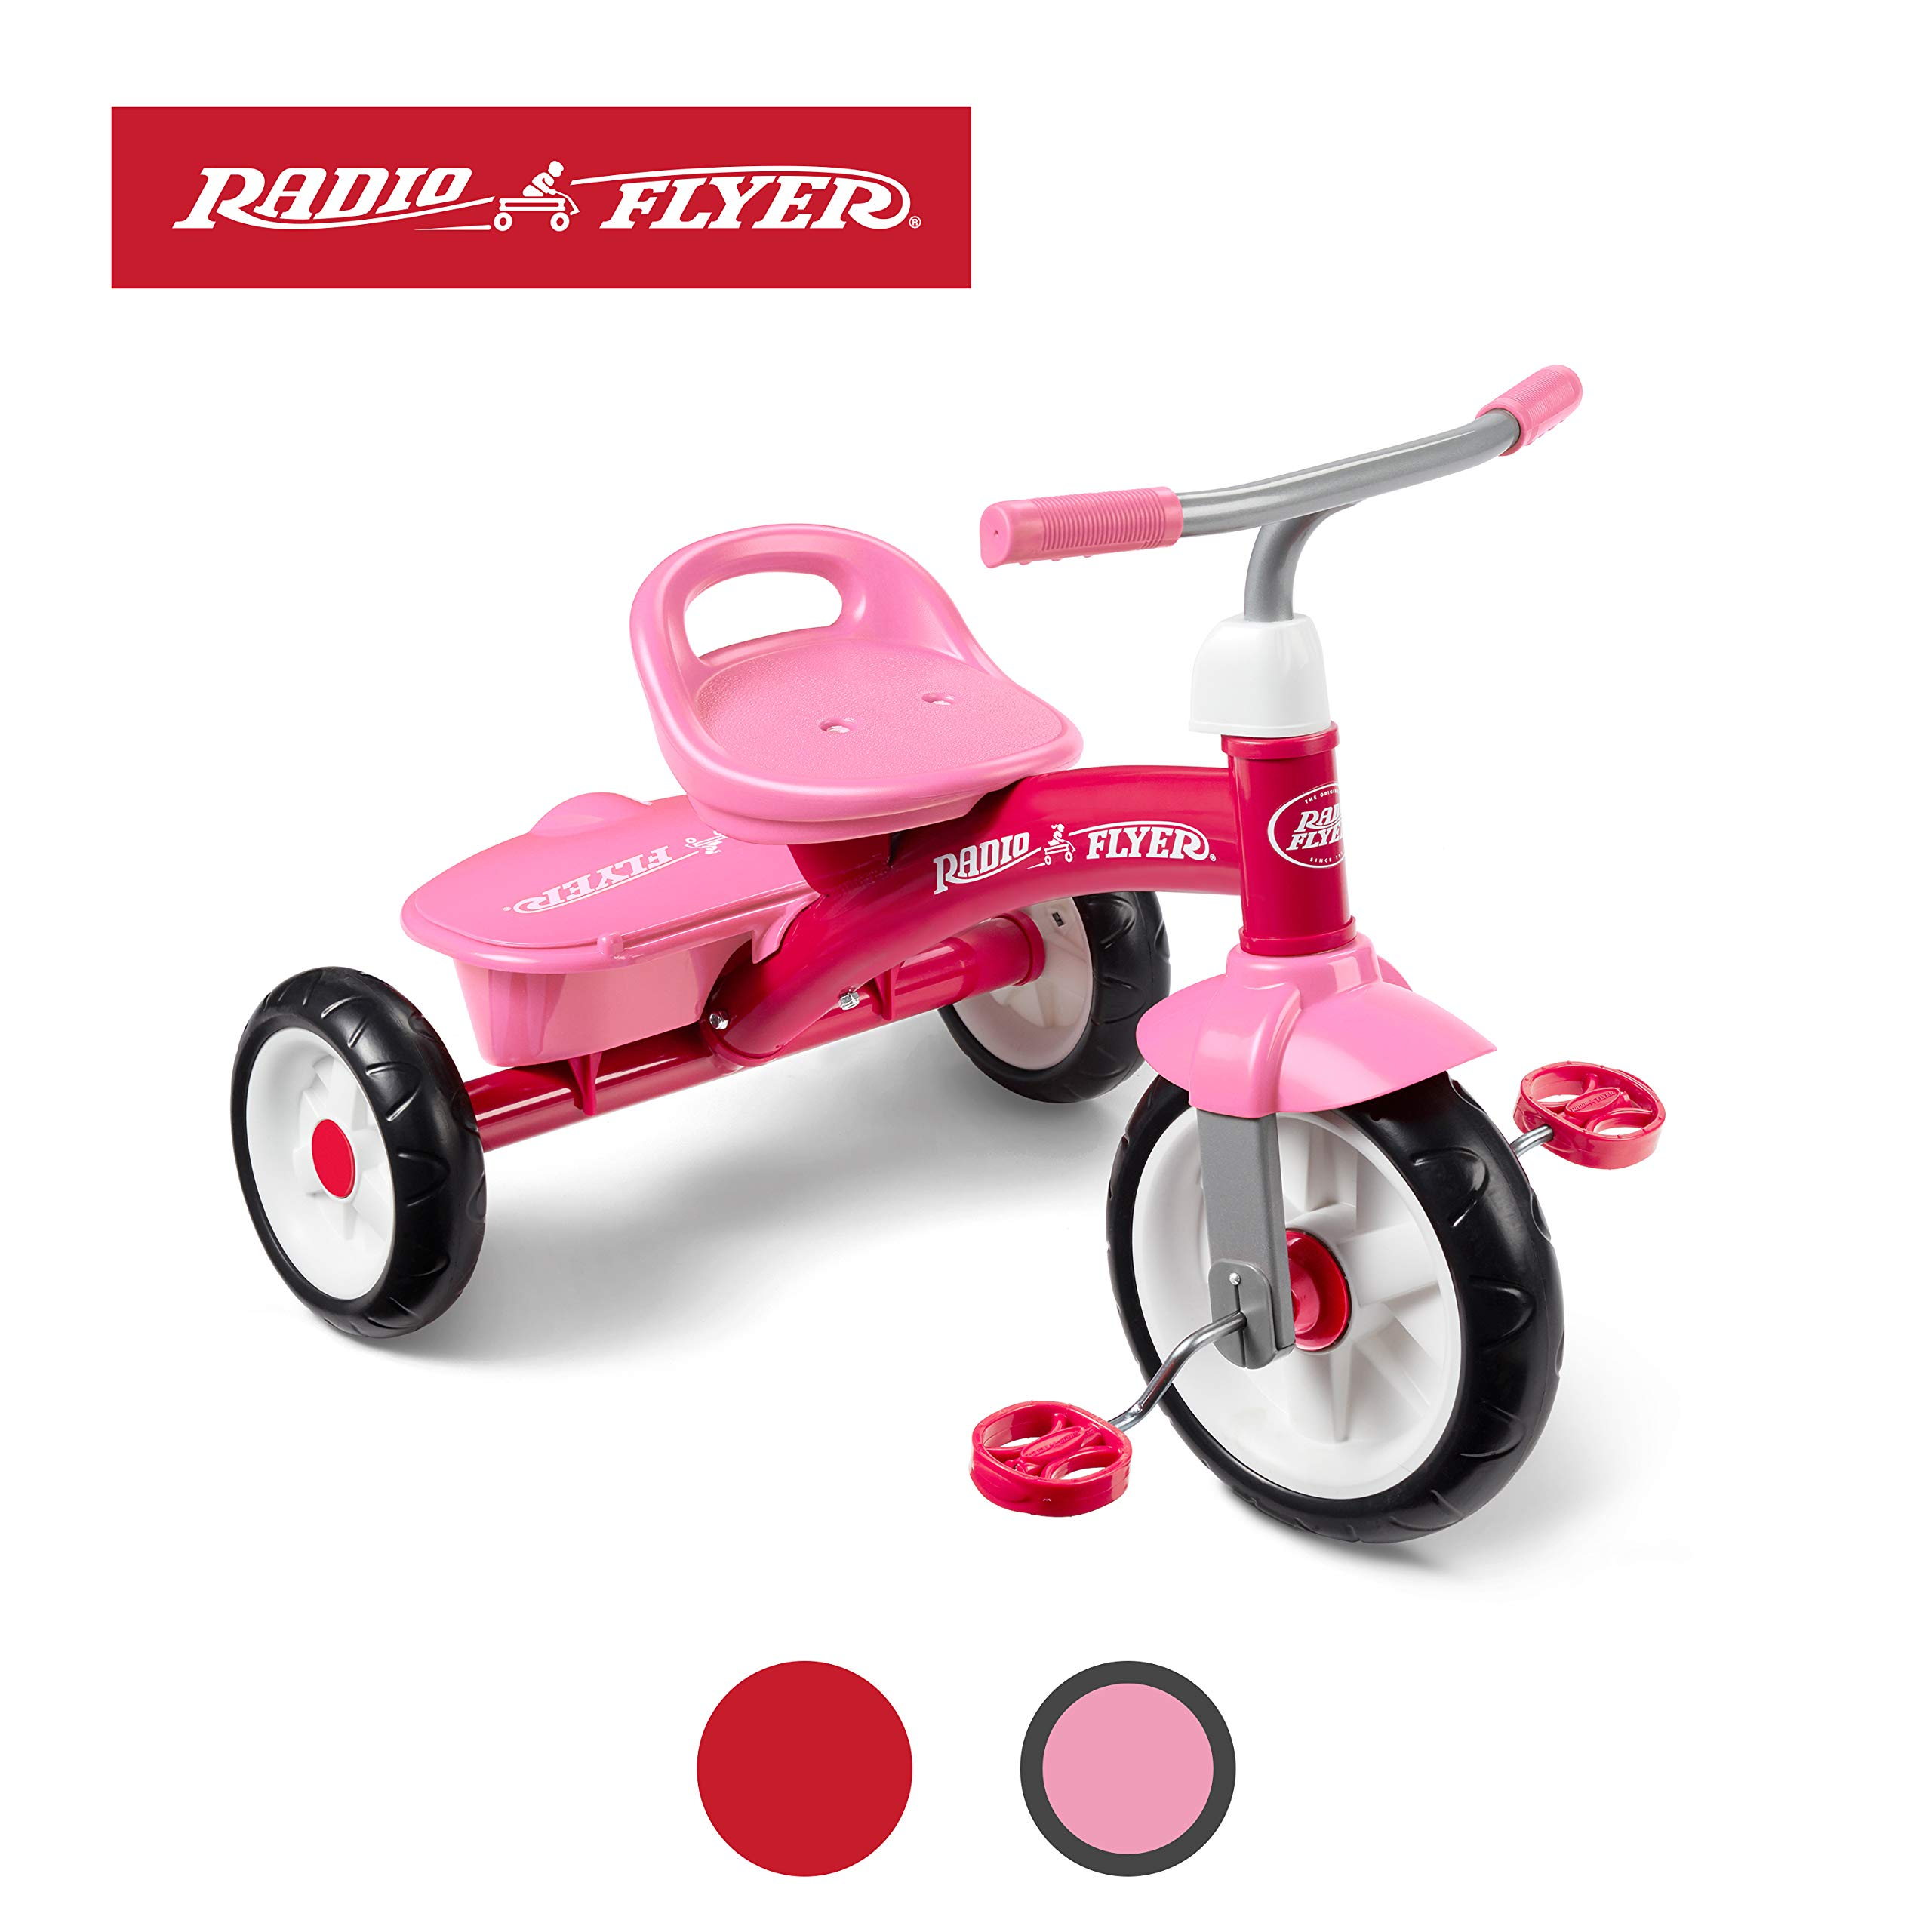 Radio Flyer Pink Rider Trike (Amazon Exclusive) by Radio Flyer